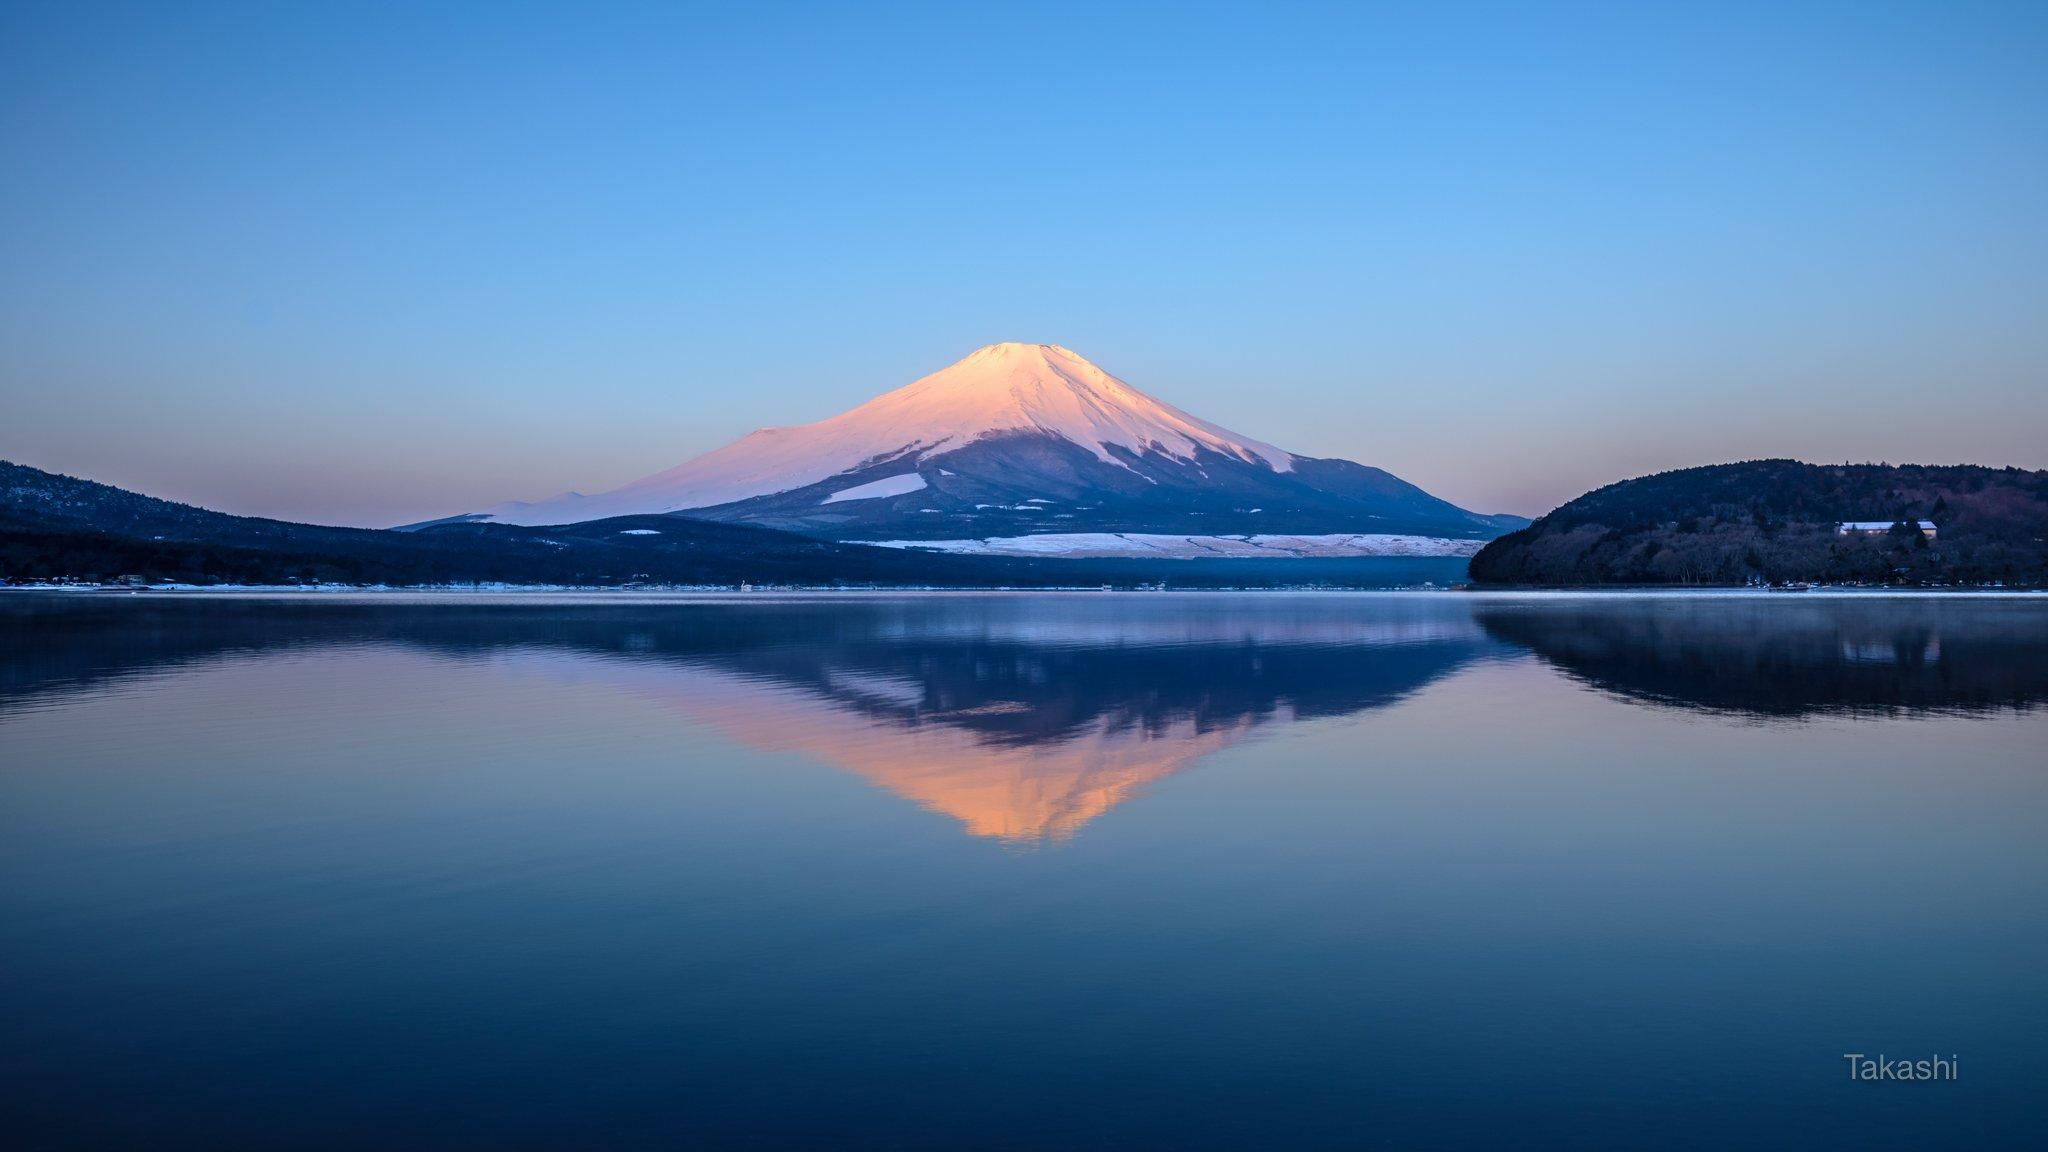 Fuji,Japan,mountain,snow,reflection,pink,sky,blue,lake,water,winter,beautiful,amazing,, Takashi